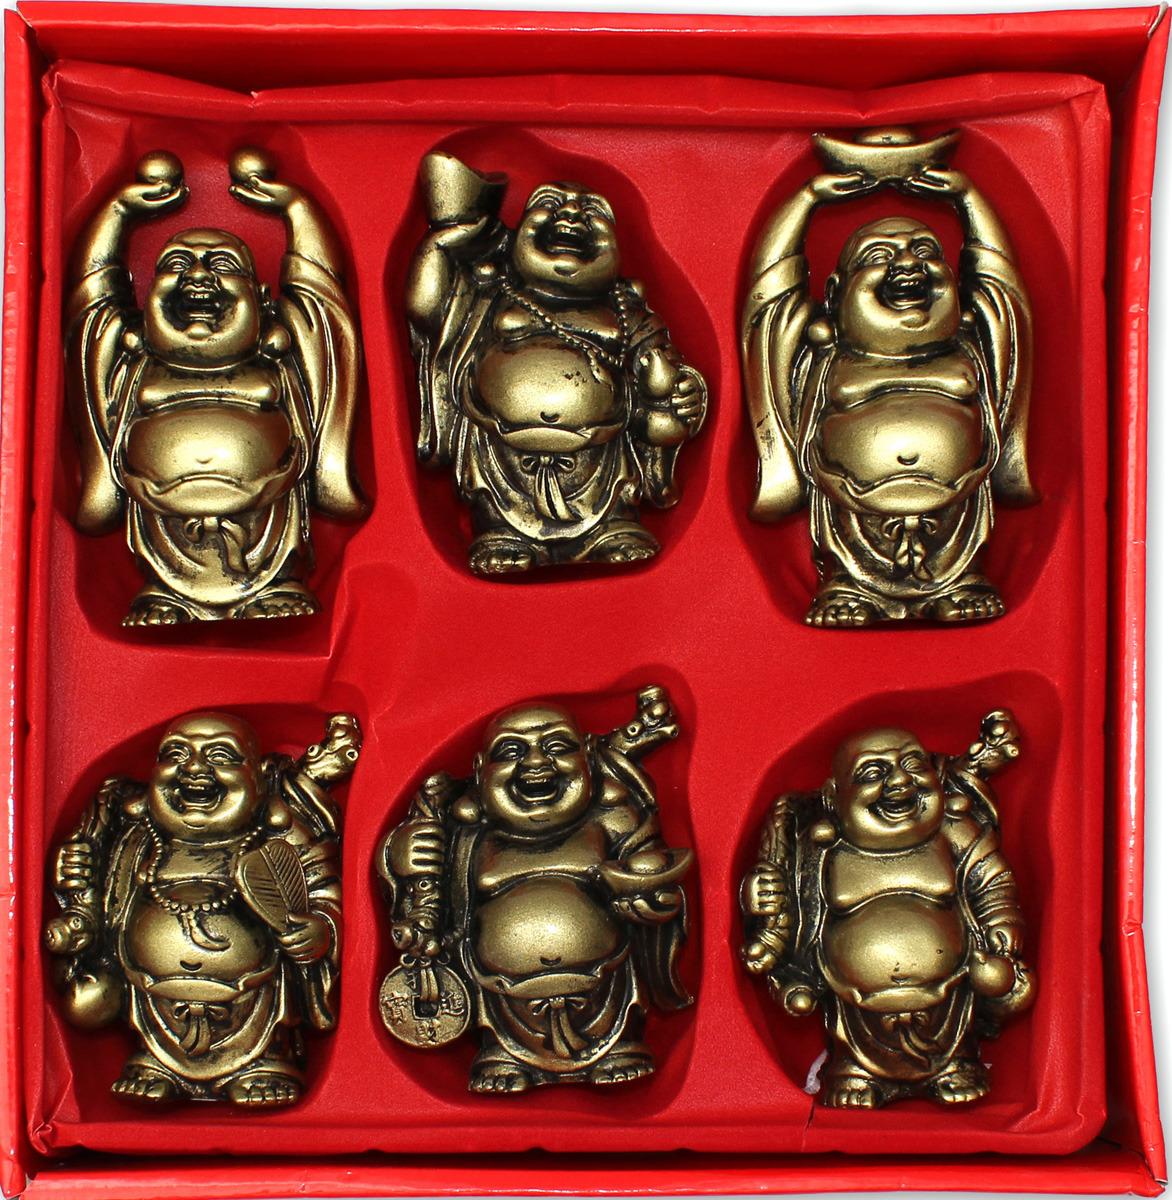 Набор статуэток Miland Хотеи исполняющие желания, Т-5008, мультиколор, 7 х 9 х 7 см, 6 шт binful 6 7 9 9 7 soft tablet case cover for ipad mini 2 3 4 air 1 universal liner sleeve tablets zipper pouch bag